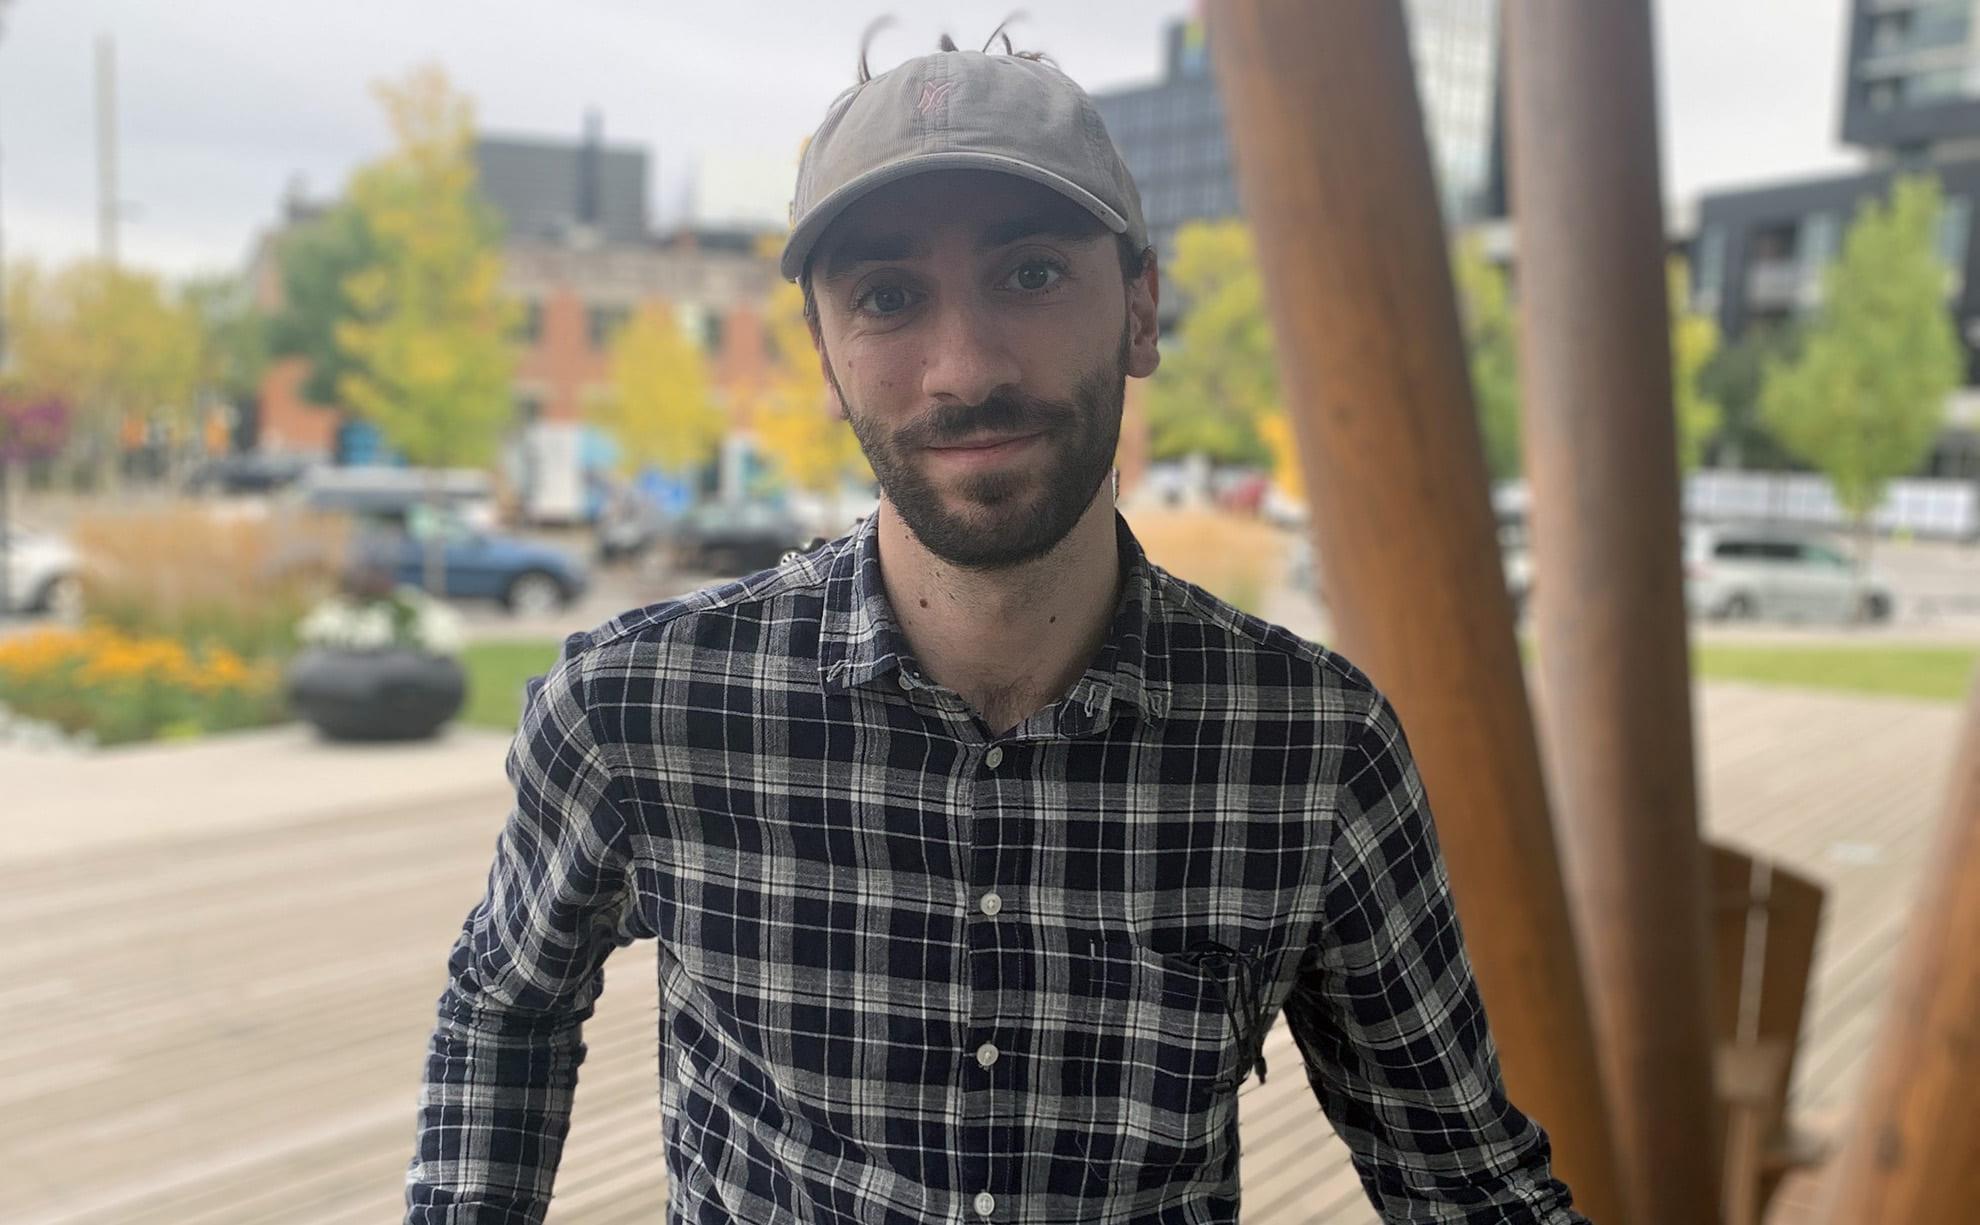 Martin Bshouty in Calgary